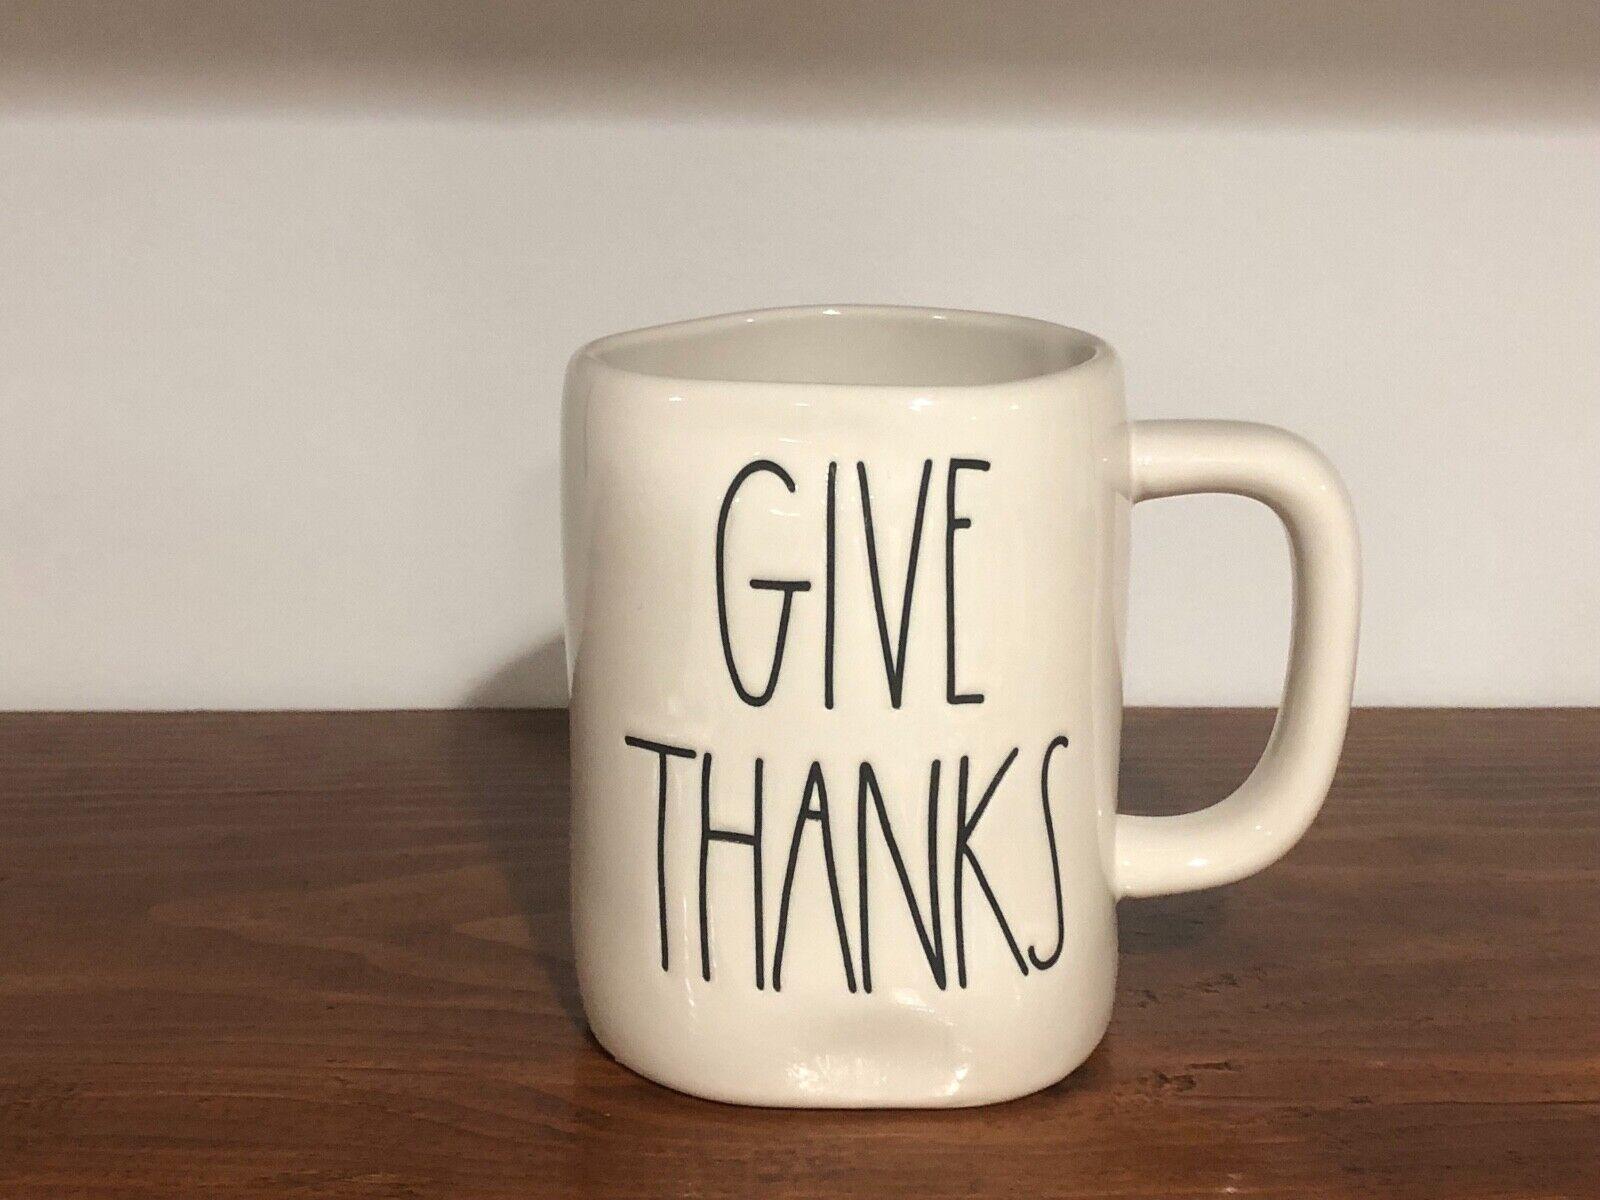 Rae Dunn Artisan Collection By Magenta Farmhouse LL Large Letter Coffee Tea Mug GIVE THANKS